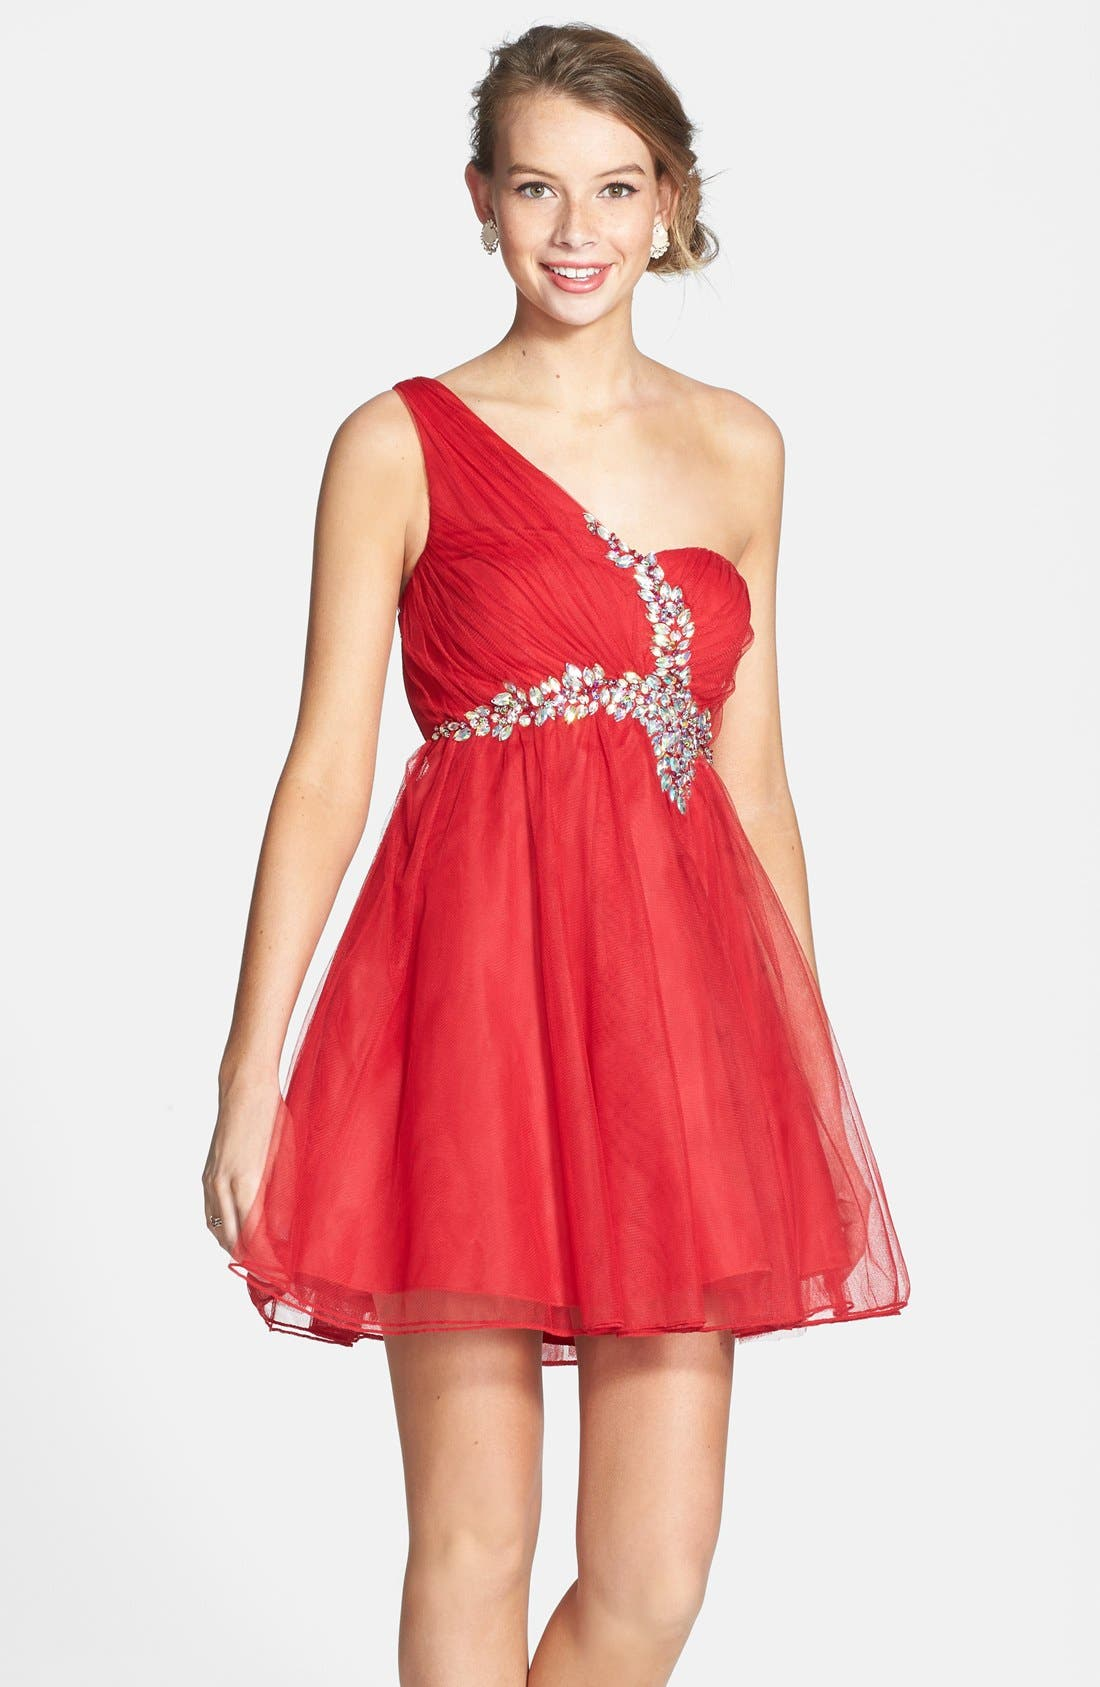 Alternate Image 1 Selected - Sequin Hearts Single Shoulder Party Dress (Juniors)